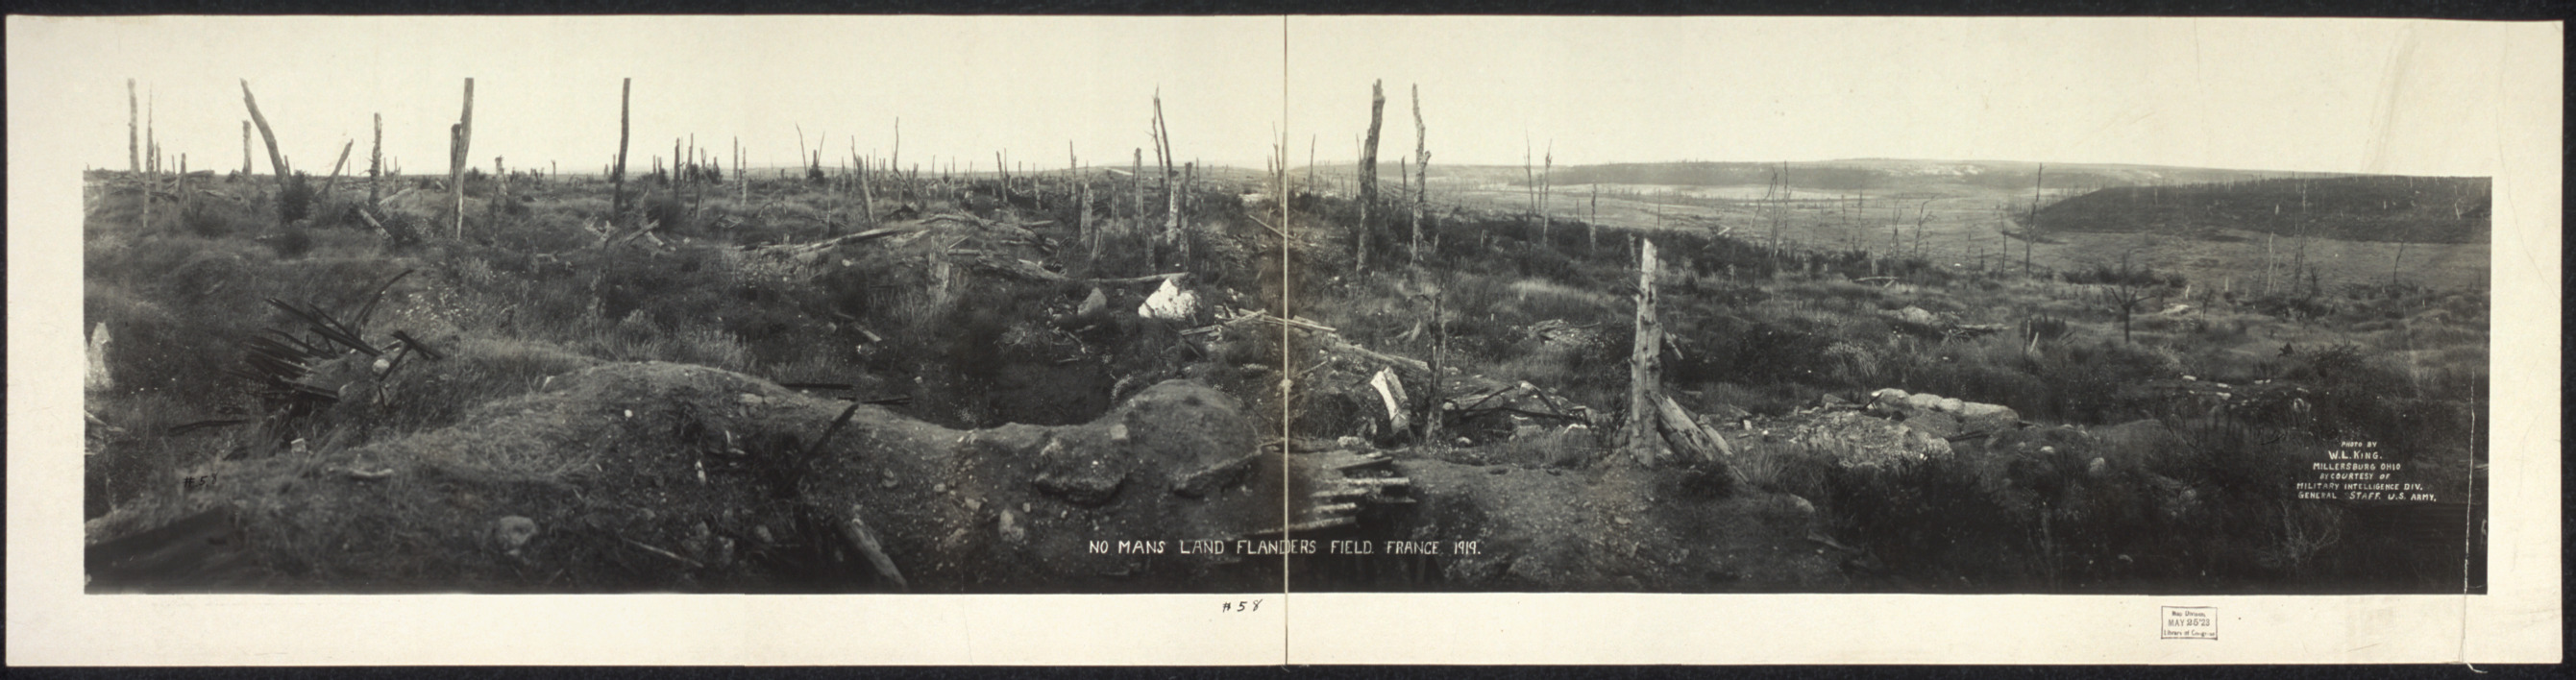 https://upload.wikimedia.org/wikipedia/commons/e/e2/No-man%27s-land-flanders-field.jpg